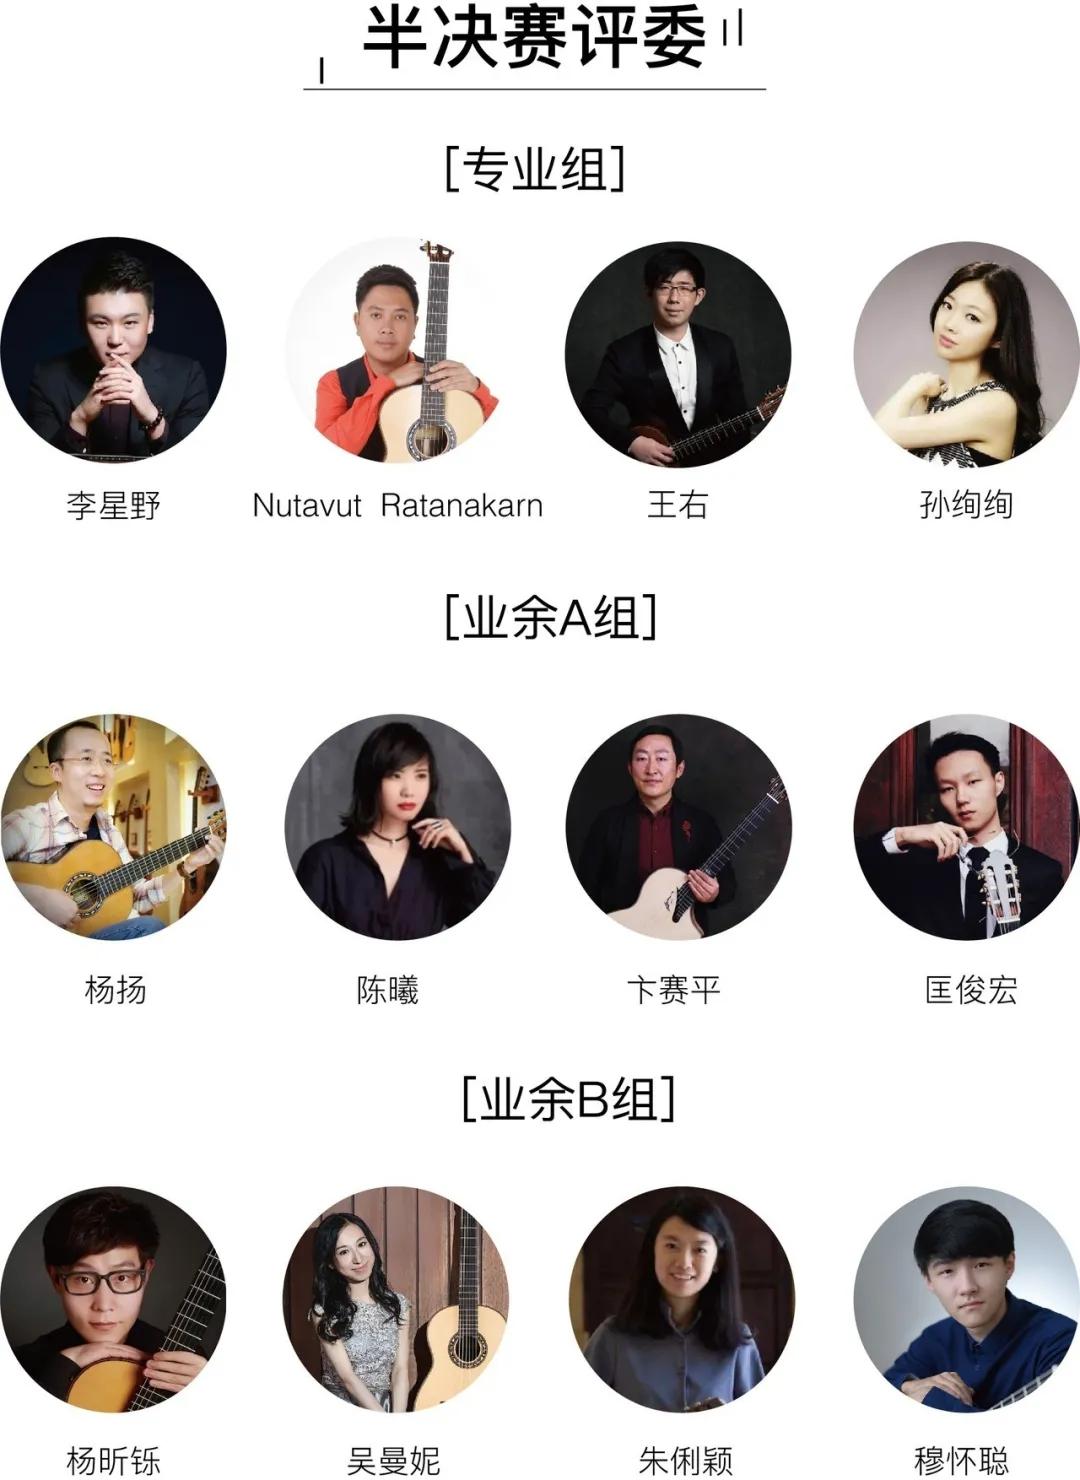 【M Live】官方发布!!! 2020 玛丁尼古典吉他大赛正式拉开帷幕